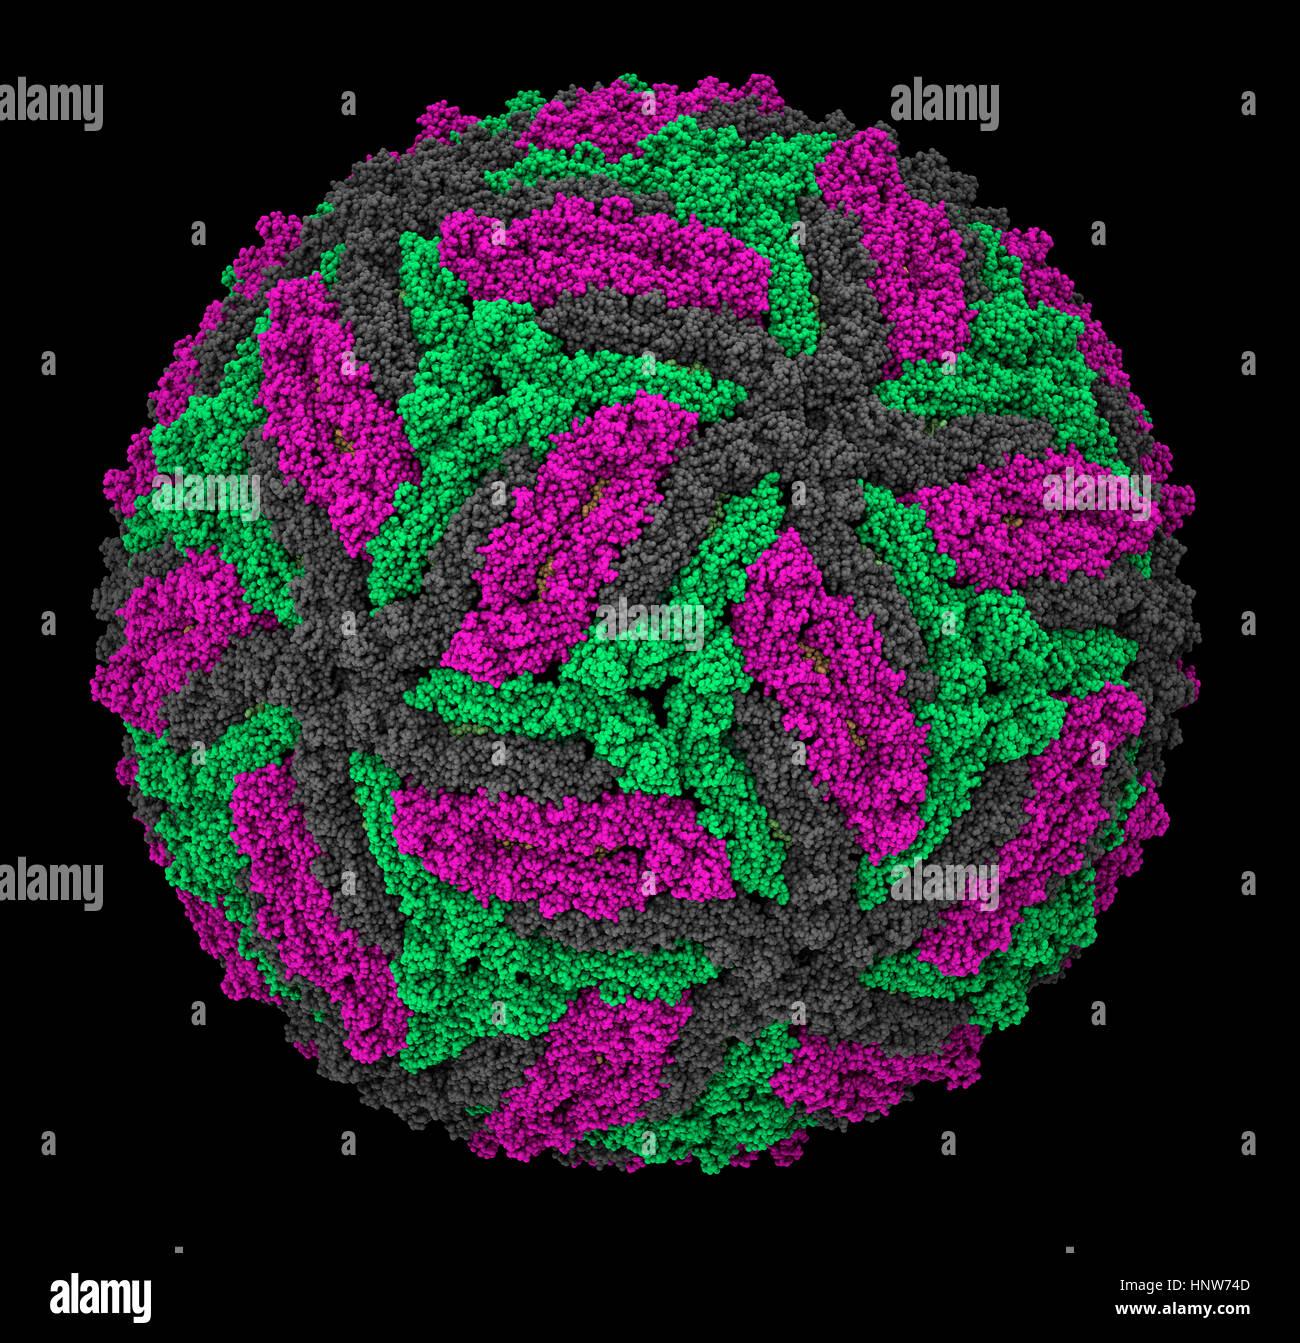 Zika virus virion capsid molecular model - Stock Image